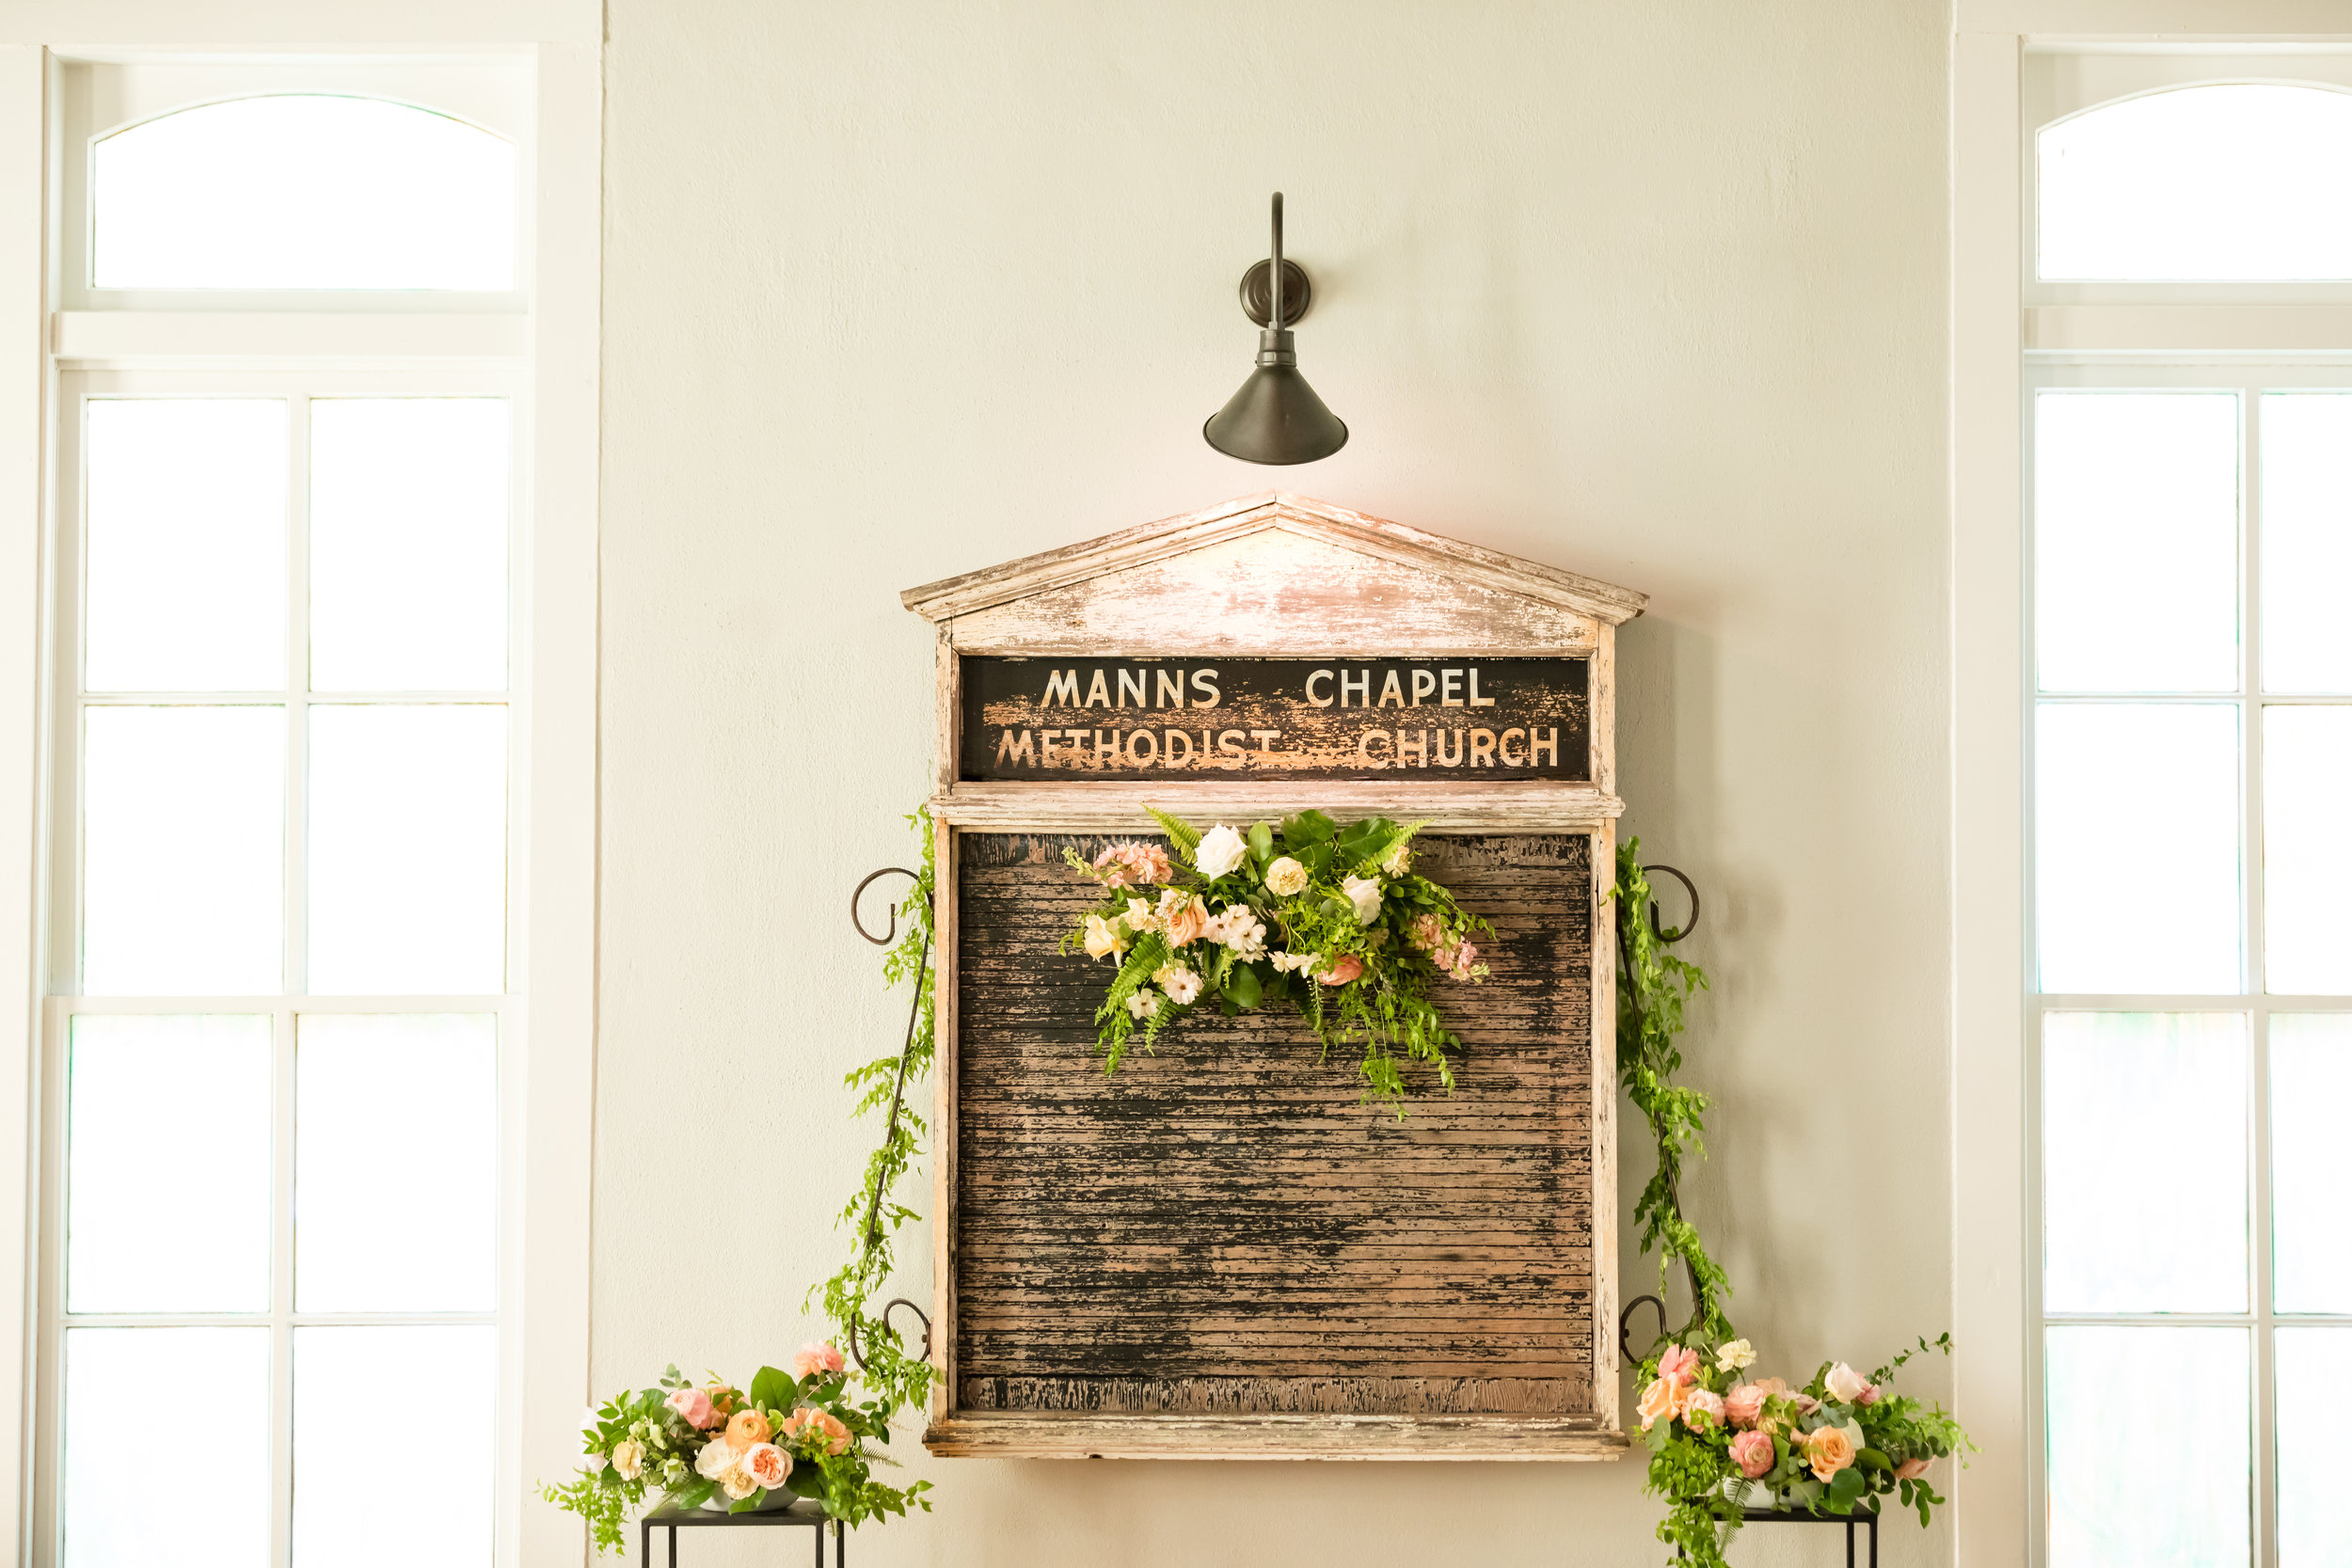 sarah_ikeem_wedding_at_the_parlour_at_manns_chapel_05.18.19-0433.jpg